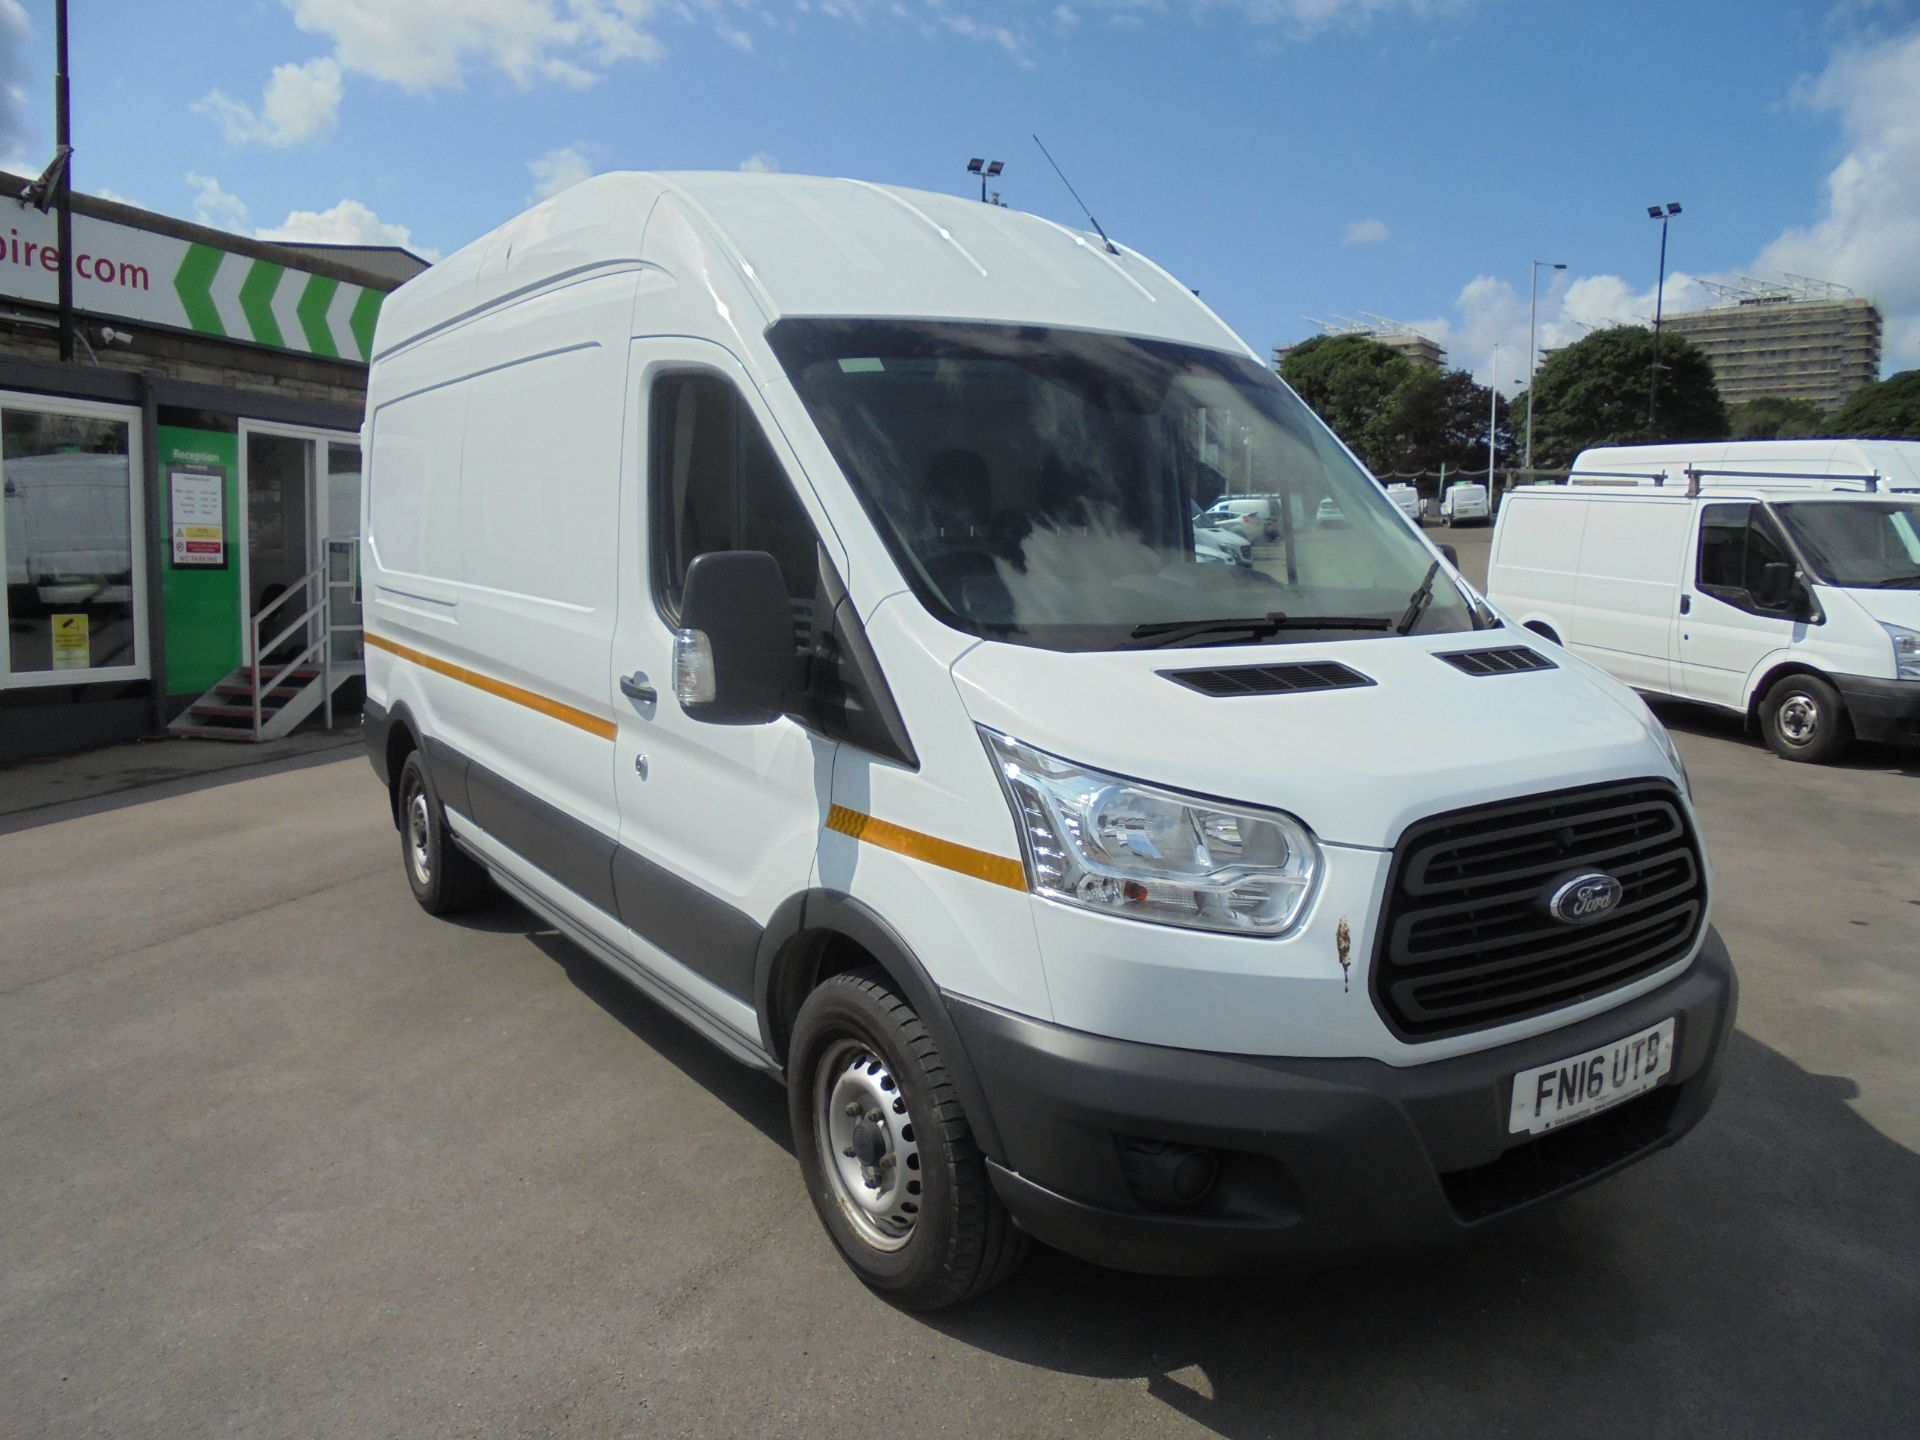 2016 Ford Transit 2.2 Tdci 125Ps H3 Van (FN16UTB) Image 1